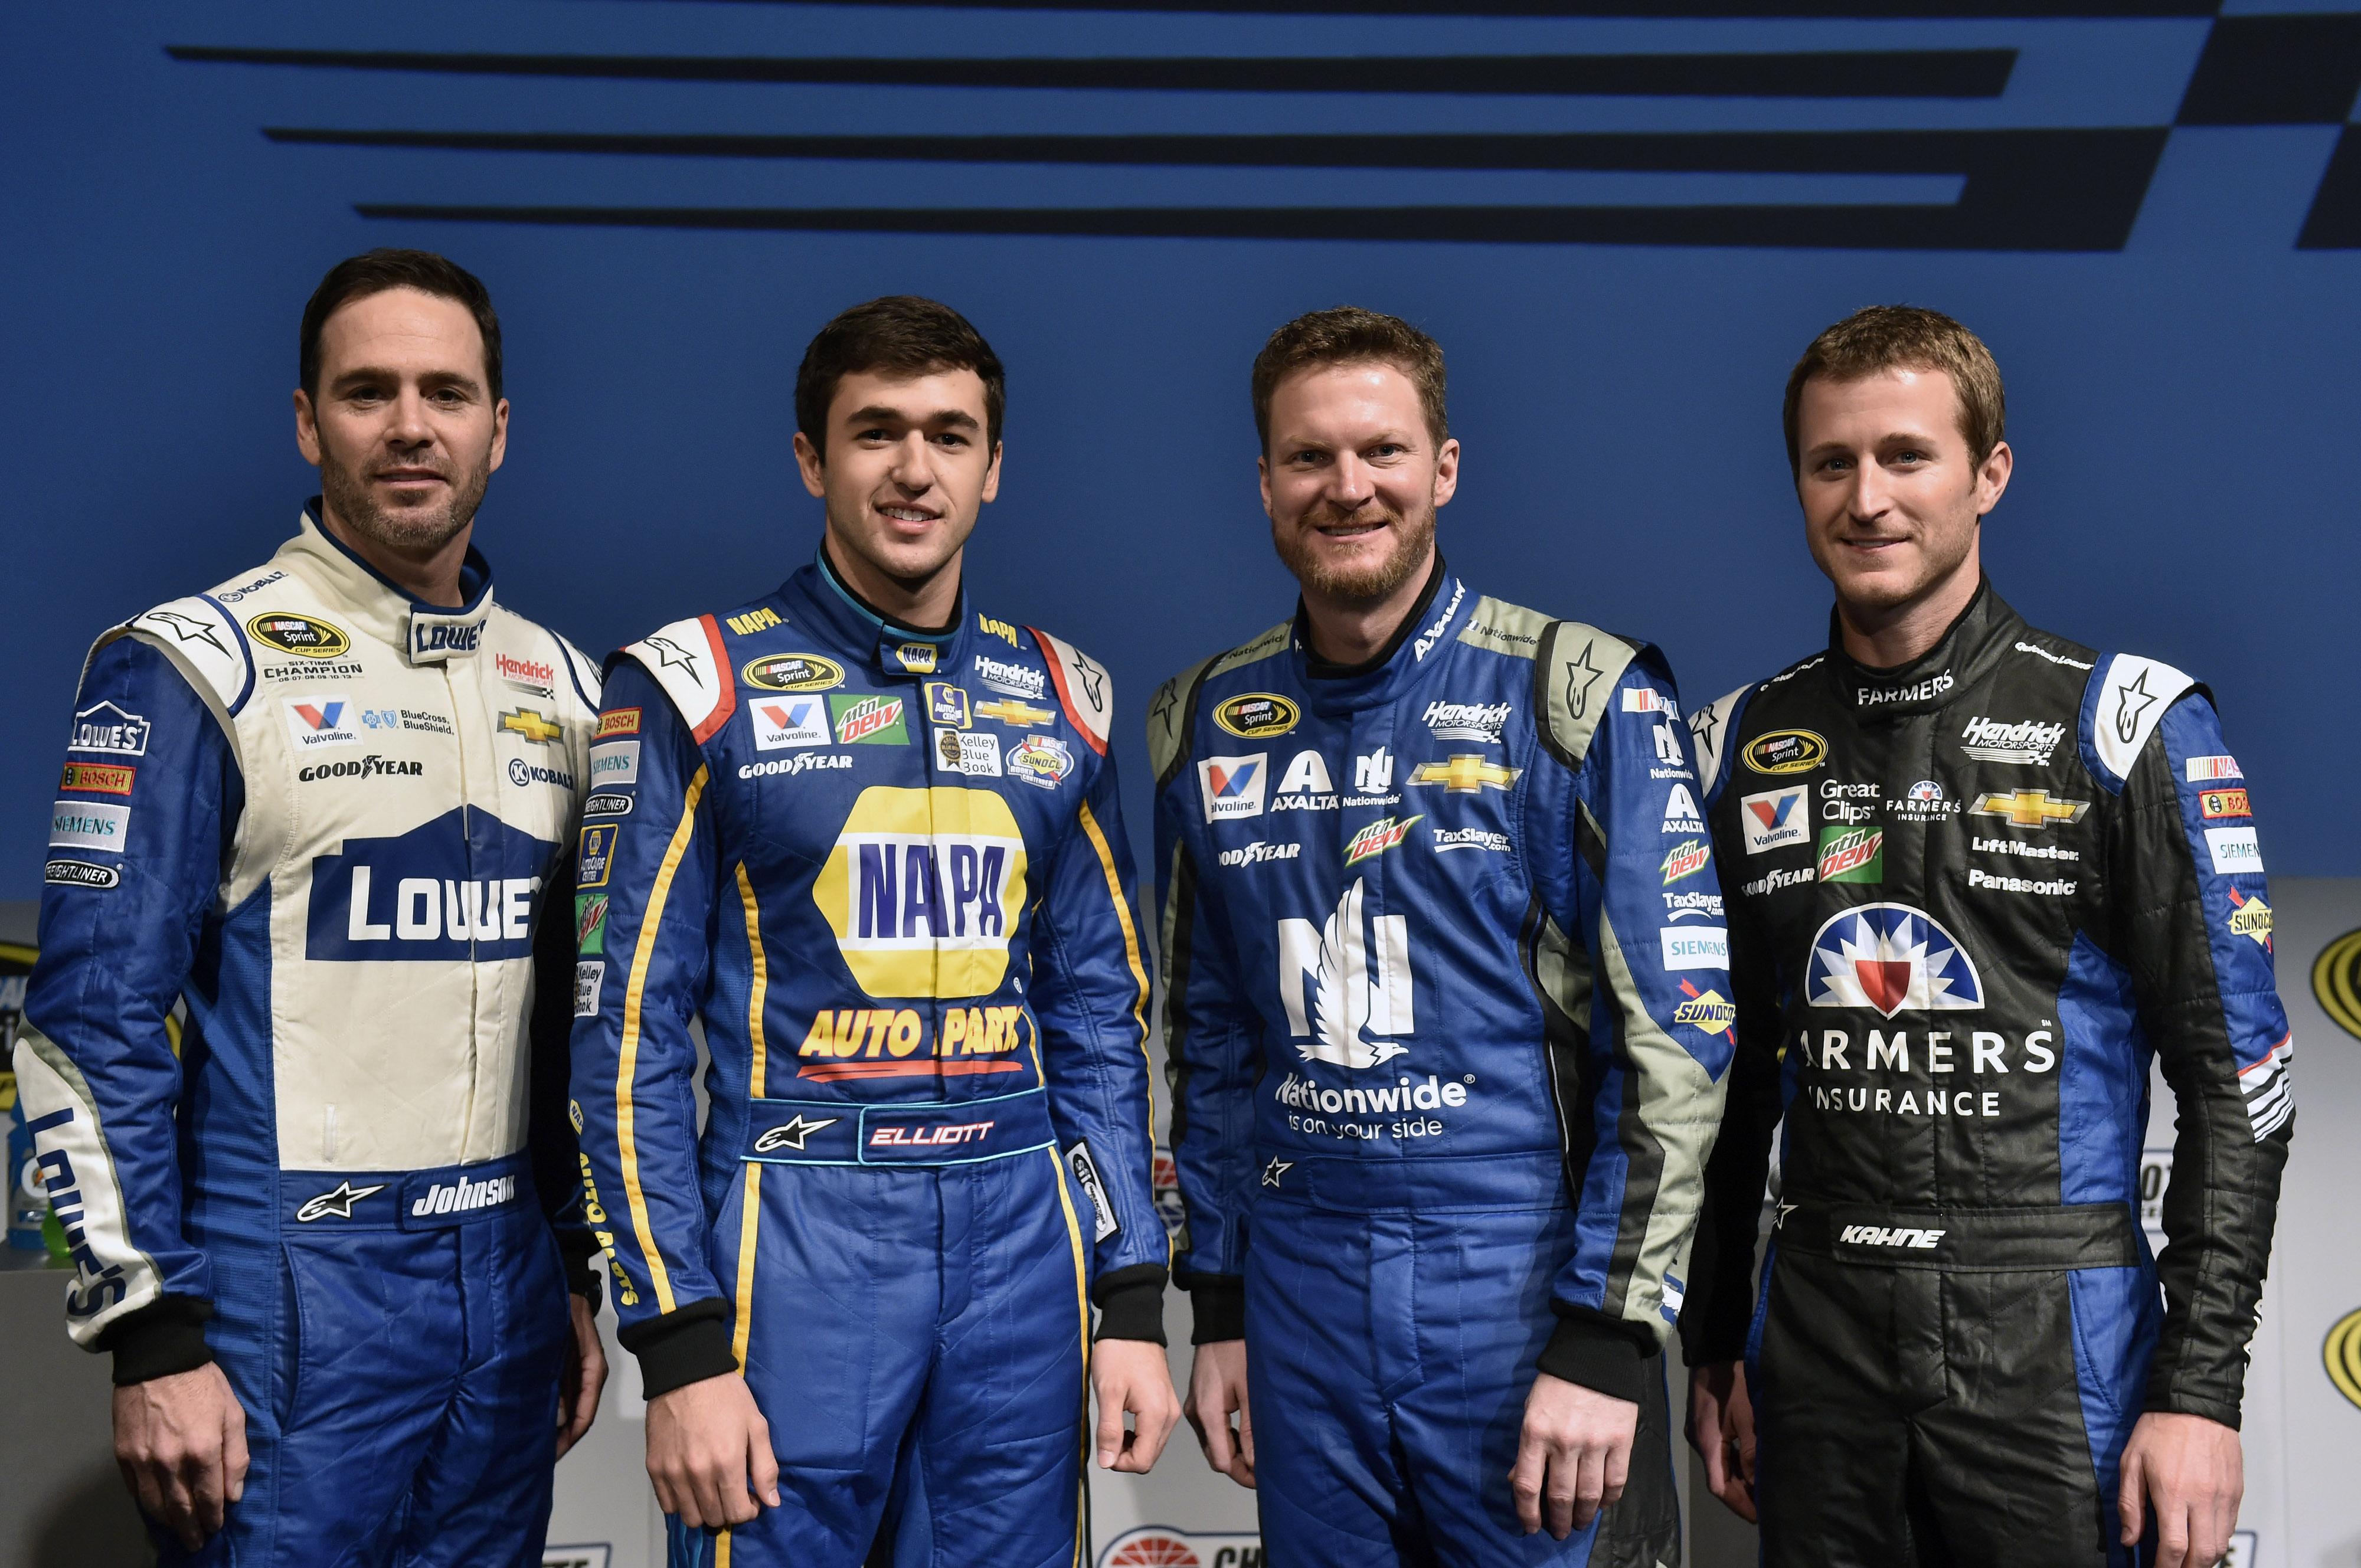 2017 NASCAR Sprint Cup Series schedule released   Hendrick Motorsports